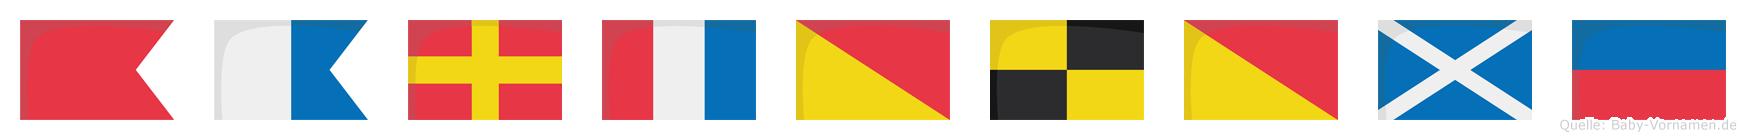 Bartolome im Flaggenalphabet